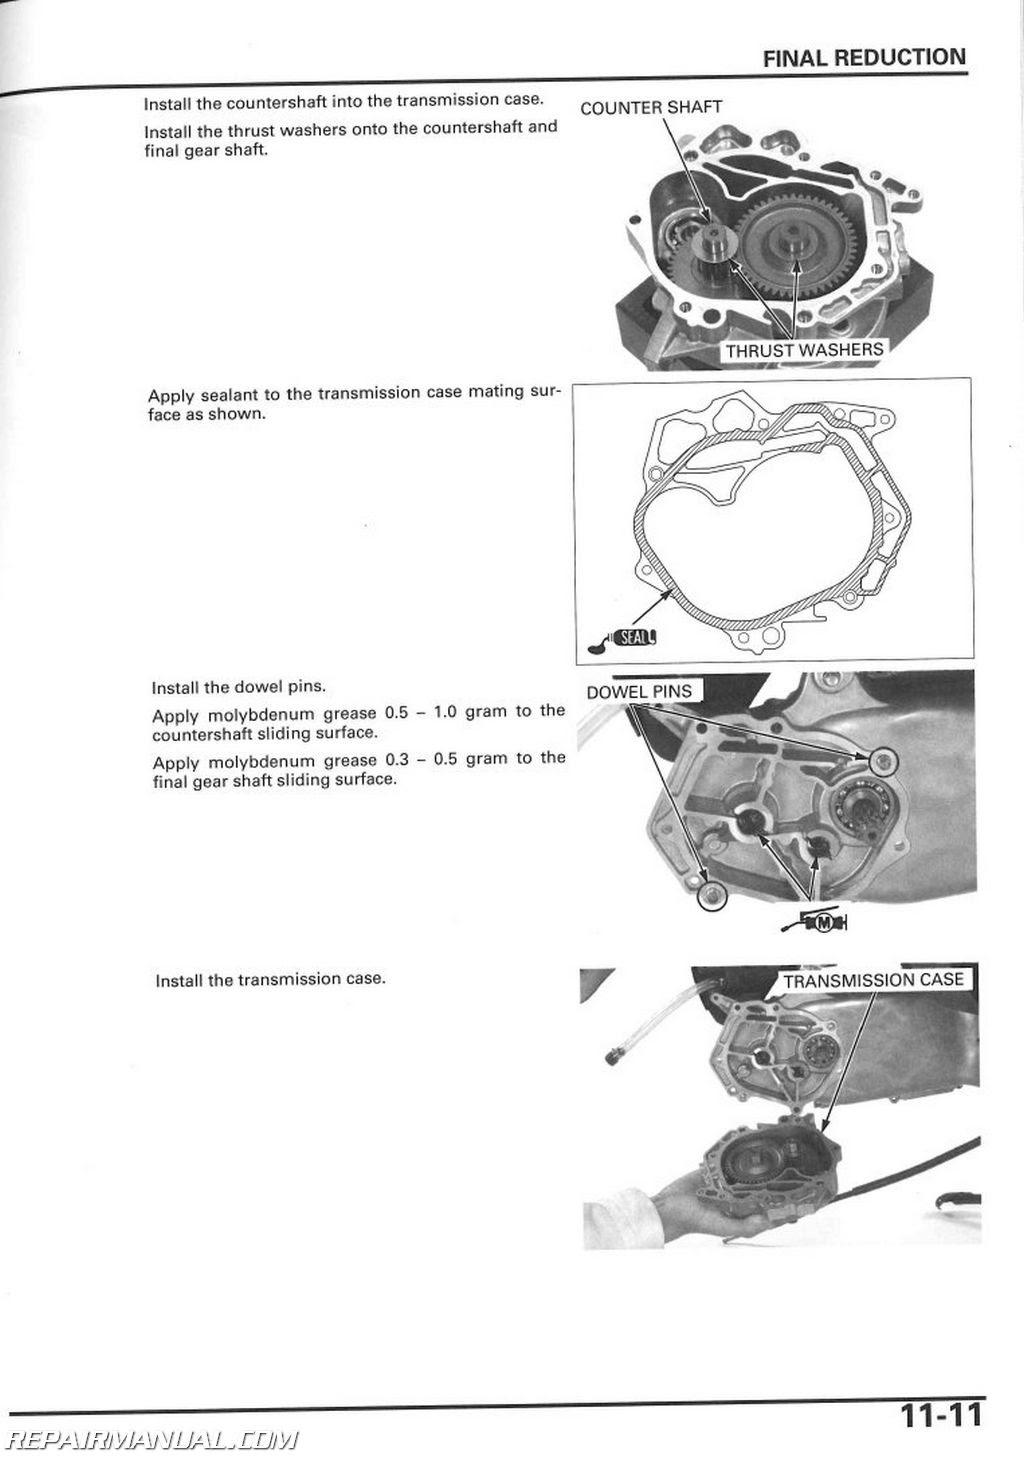 Diagram Honda Nps50 Wiring Diagram Full Version Hd Quality Wiring Diagram Stereodiagram1c Portoniathos It